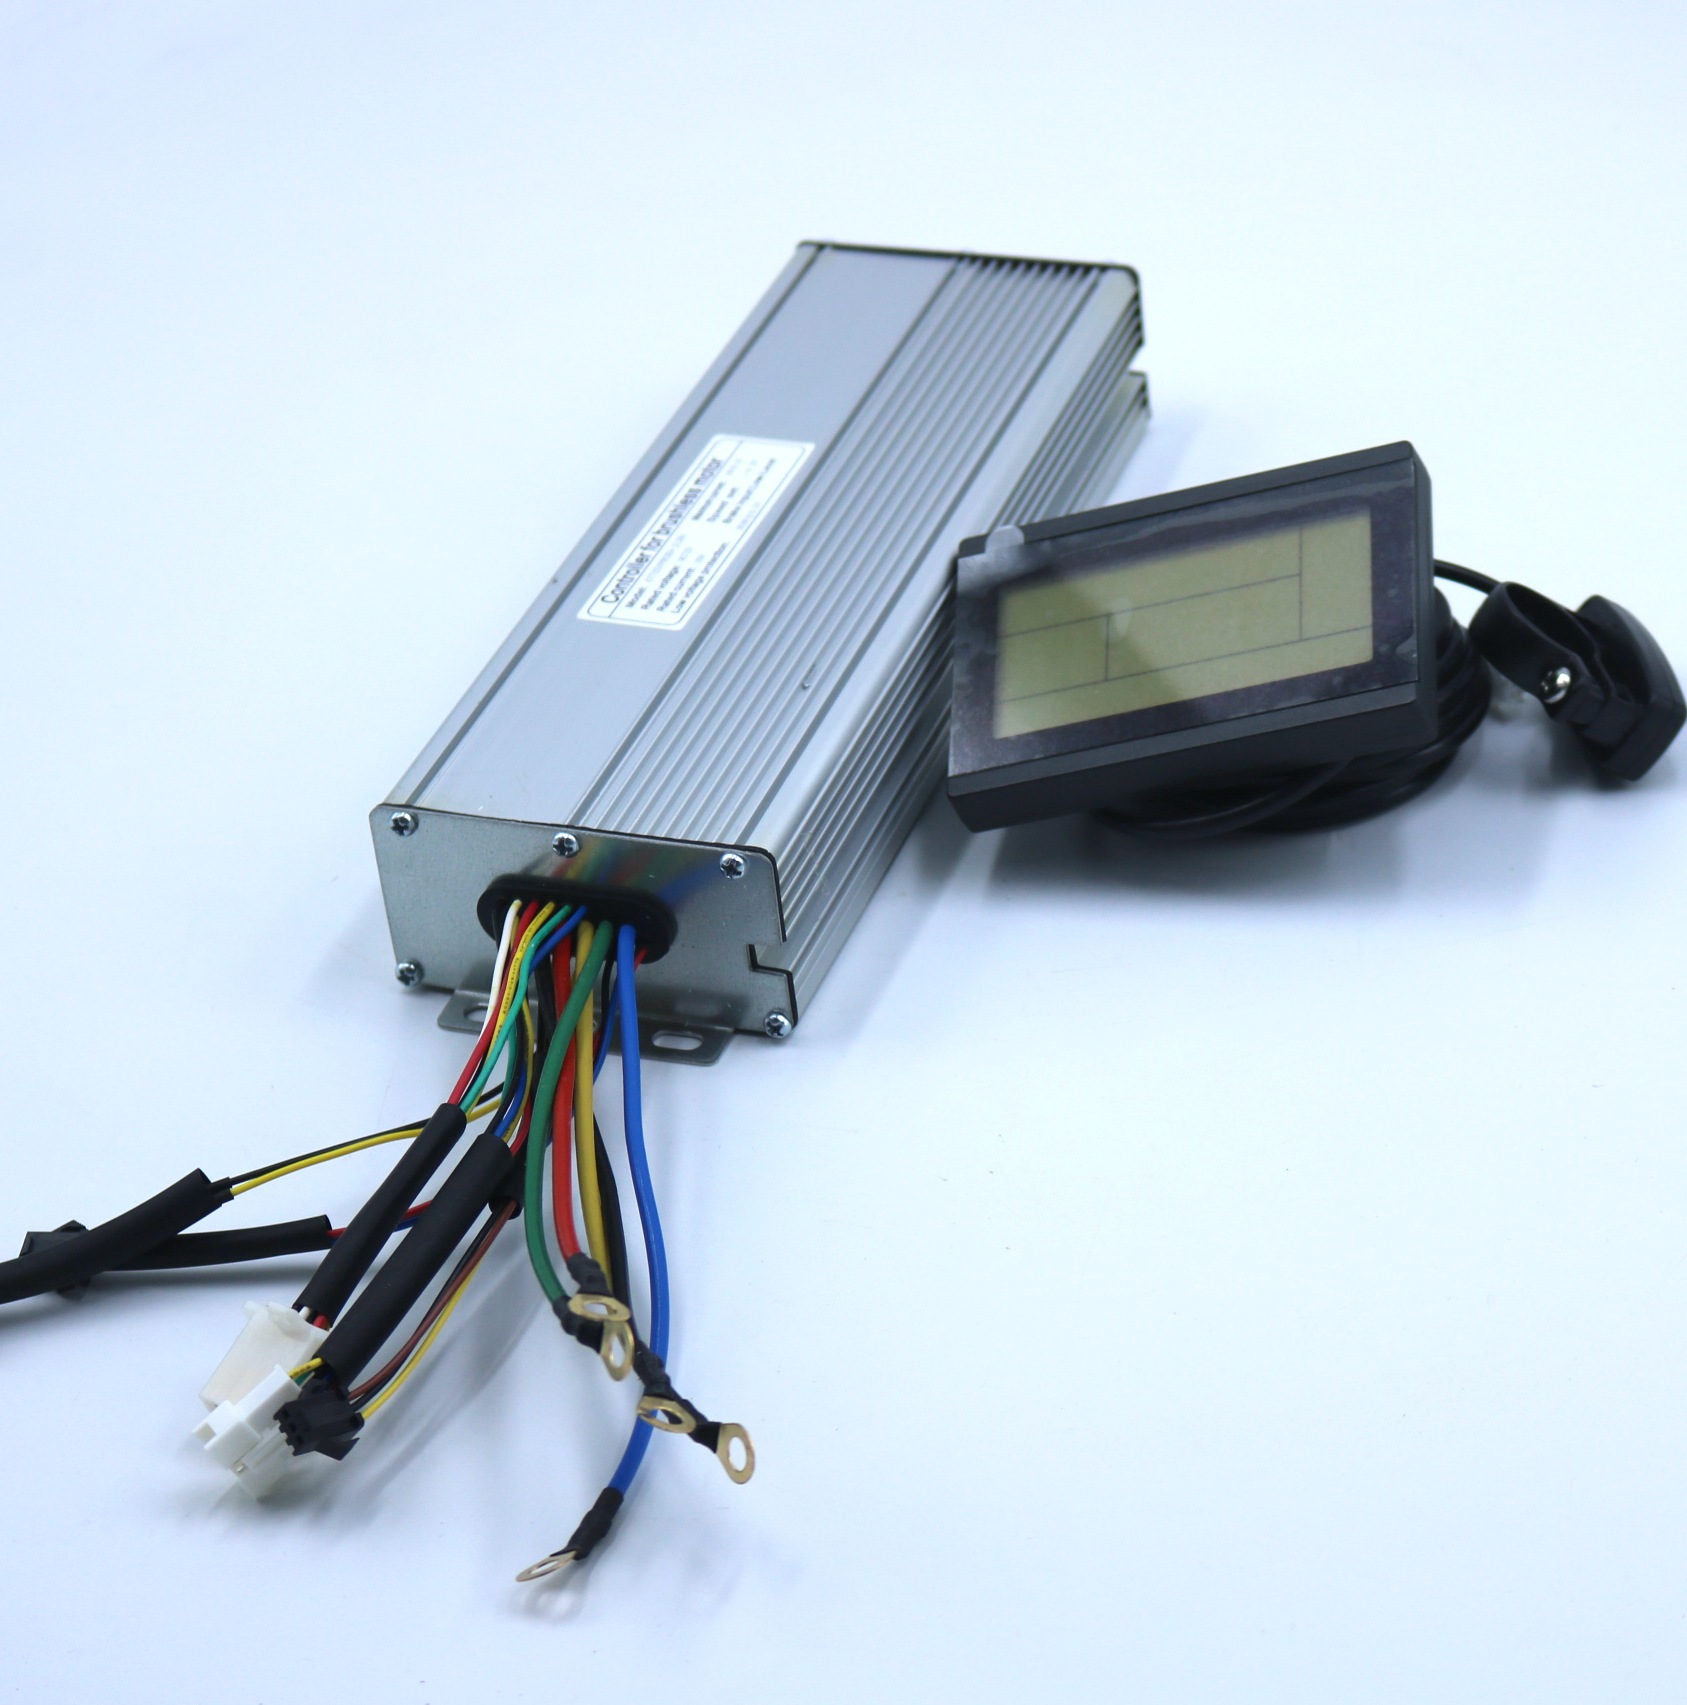 72V 2500W-3000W 60Amax Brushless DC Motor Controller Ebike LCD3 KUNTENG Sine Wave Controller +KT-LCD3 Display One Set